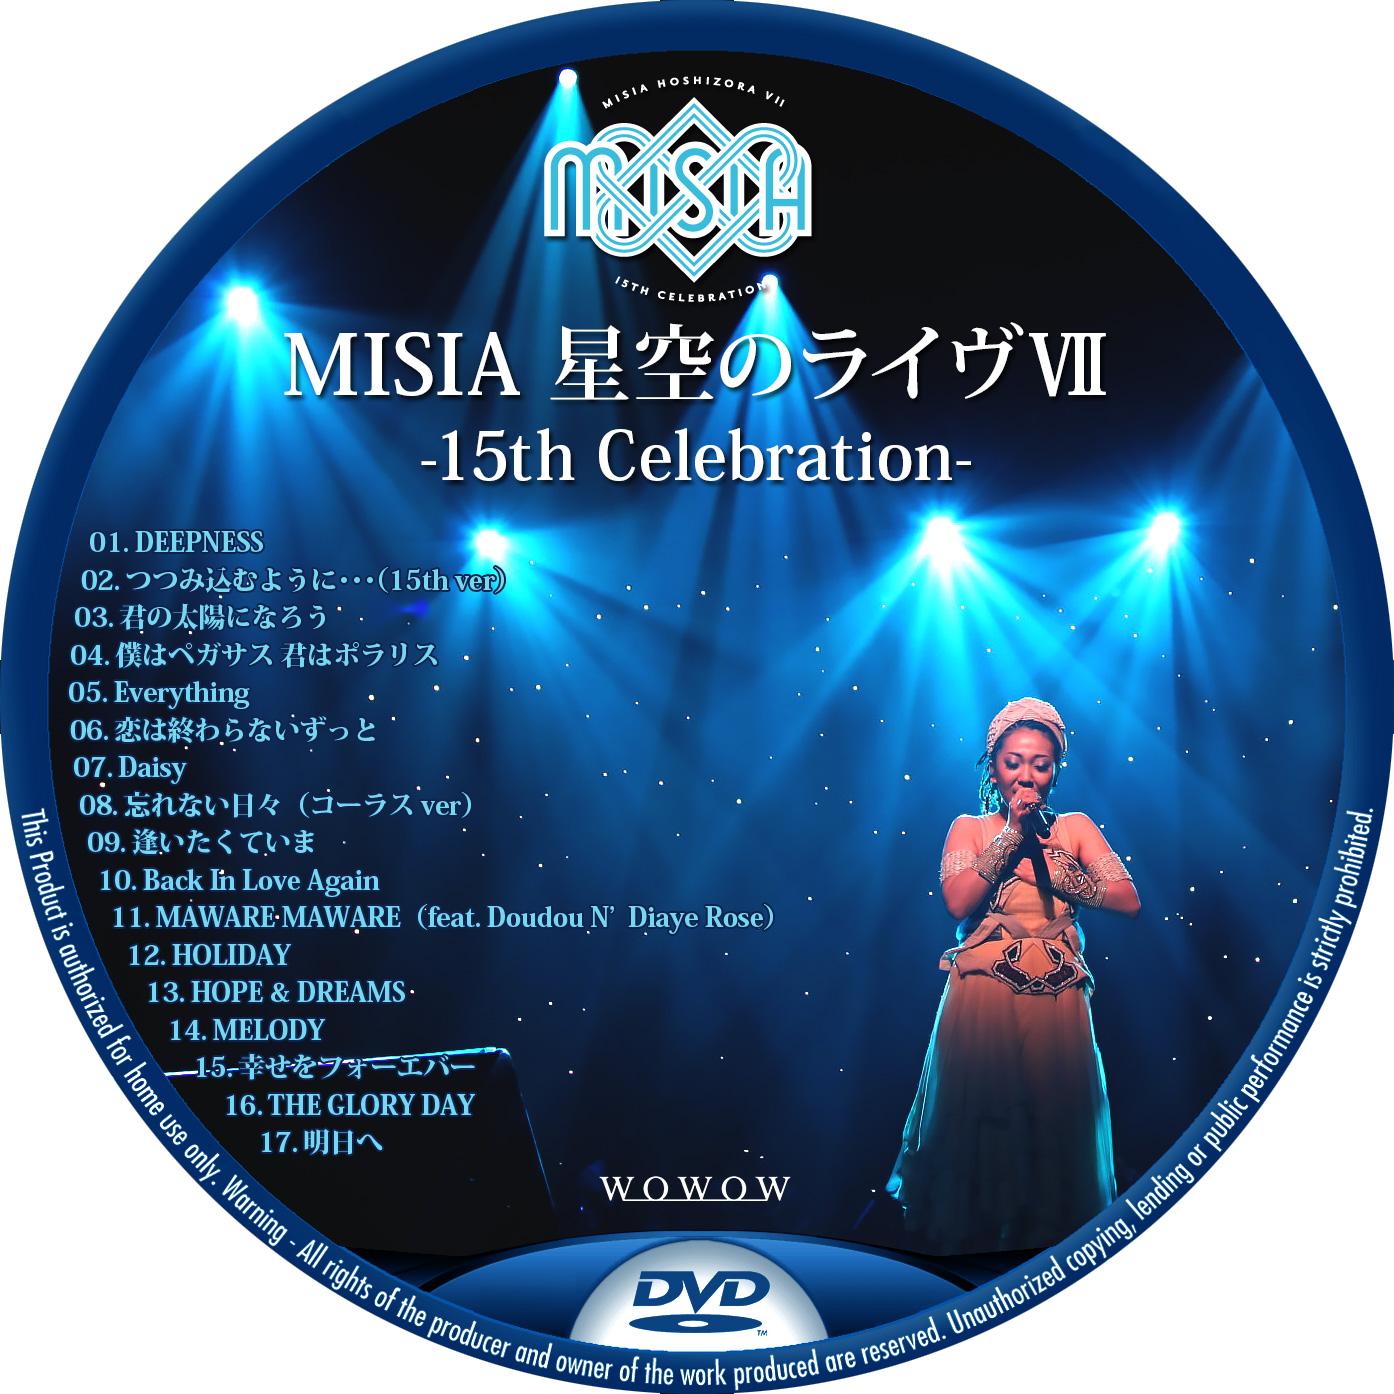 MISIA 星空のライヴⅦ DVDラベル